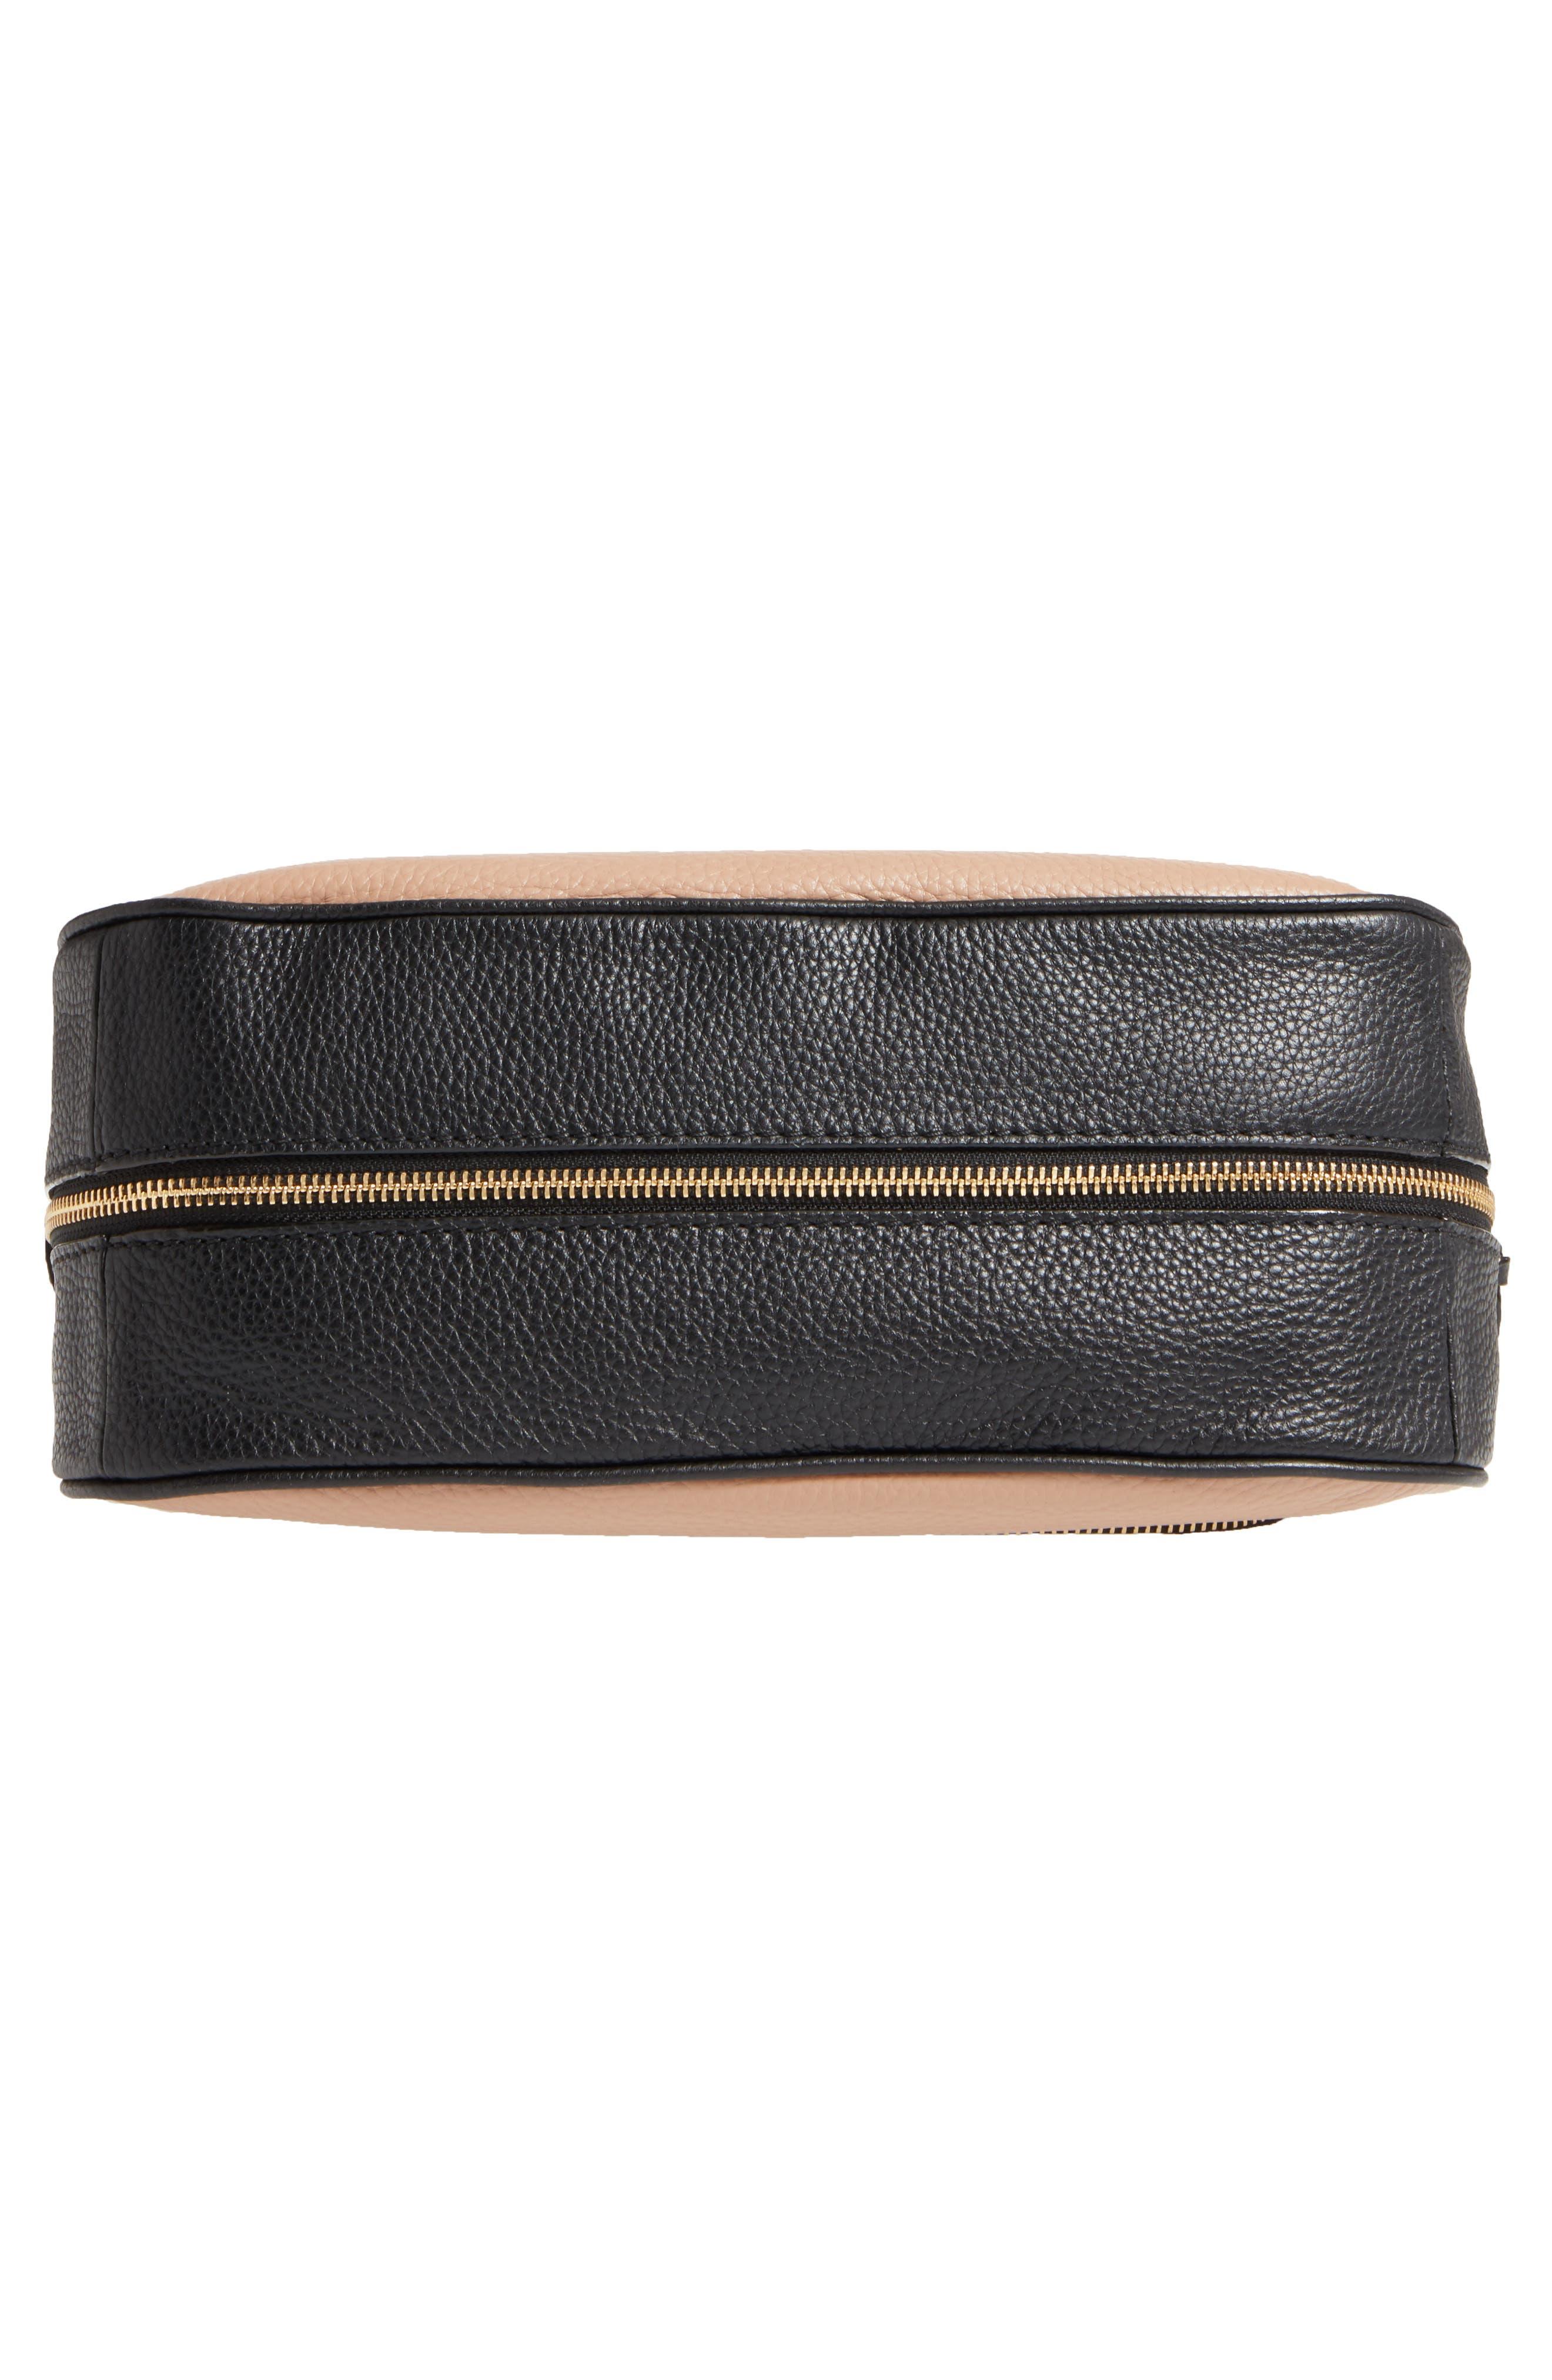 cobble hill - deva leather crossbody bag,                             Alternate thumbnail 38, color,